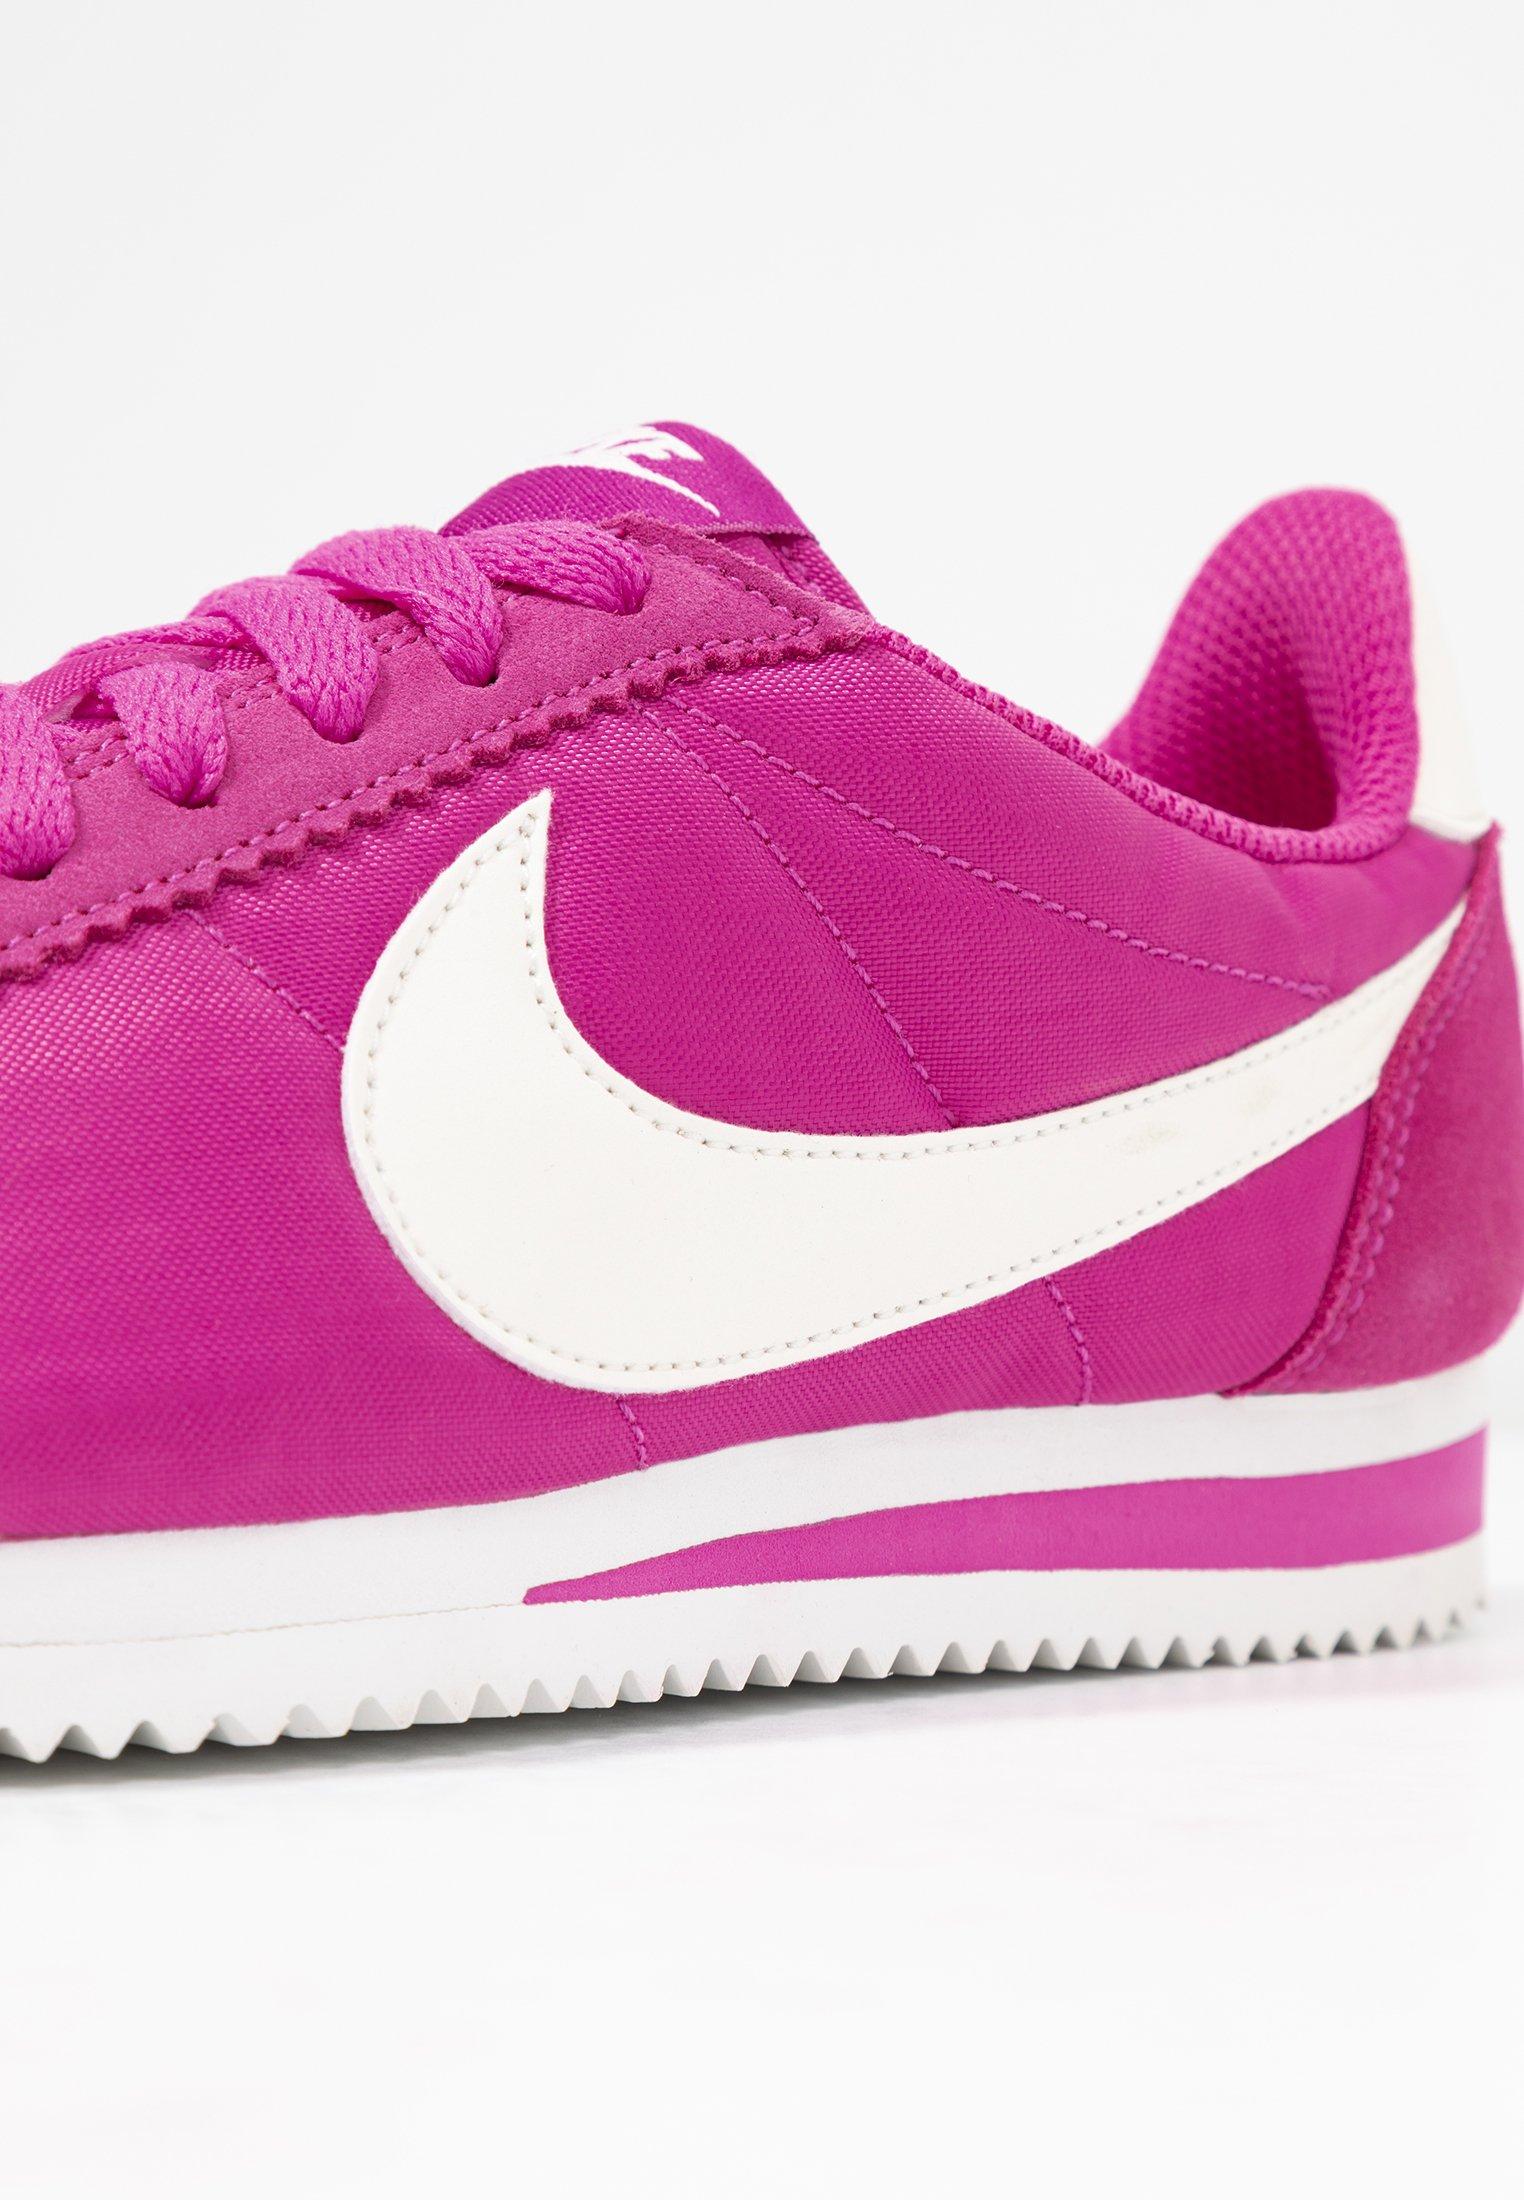 CortezBaskets Basses Fuchsia Active Sportswear Nike White Classic summit xedBCo